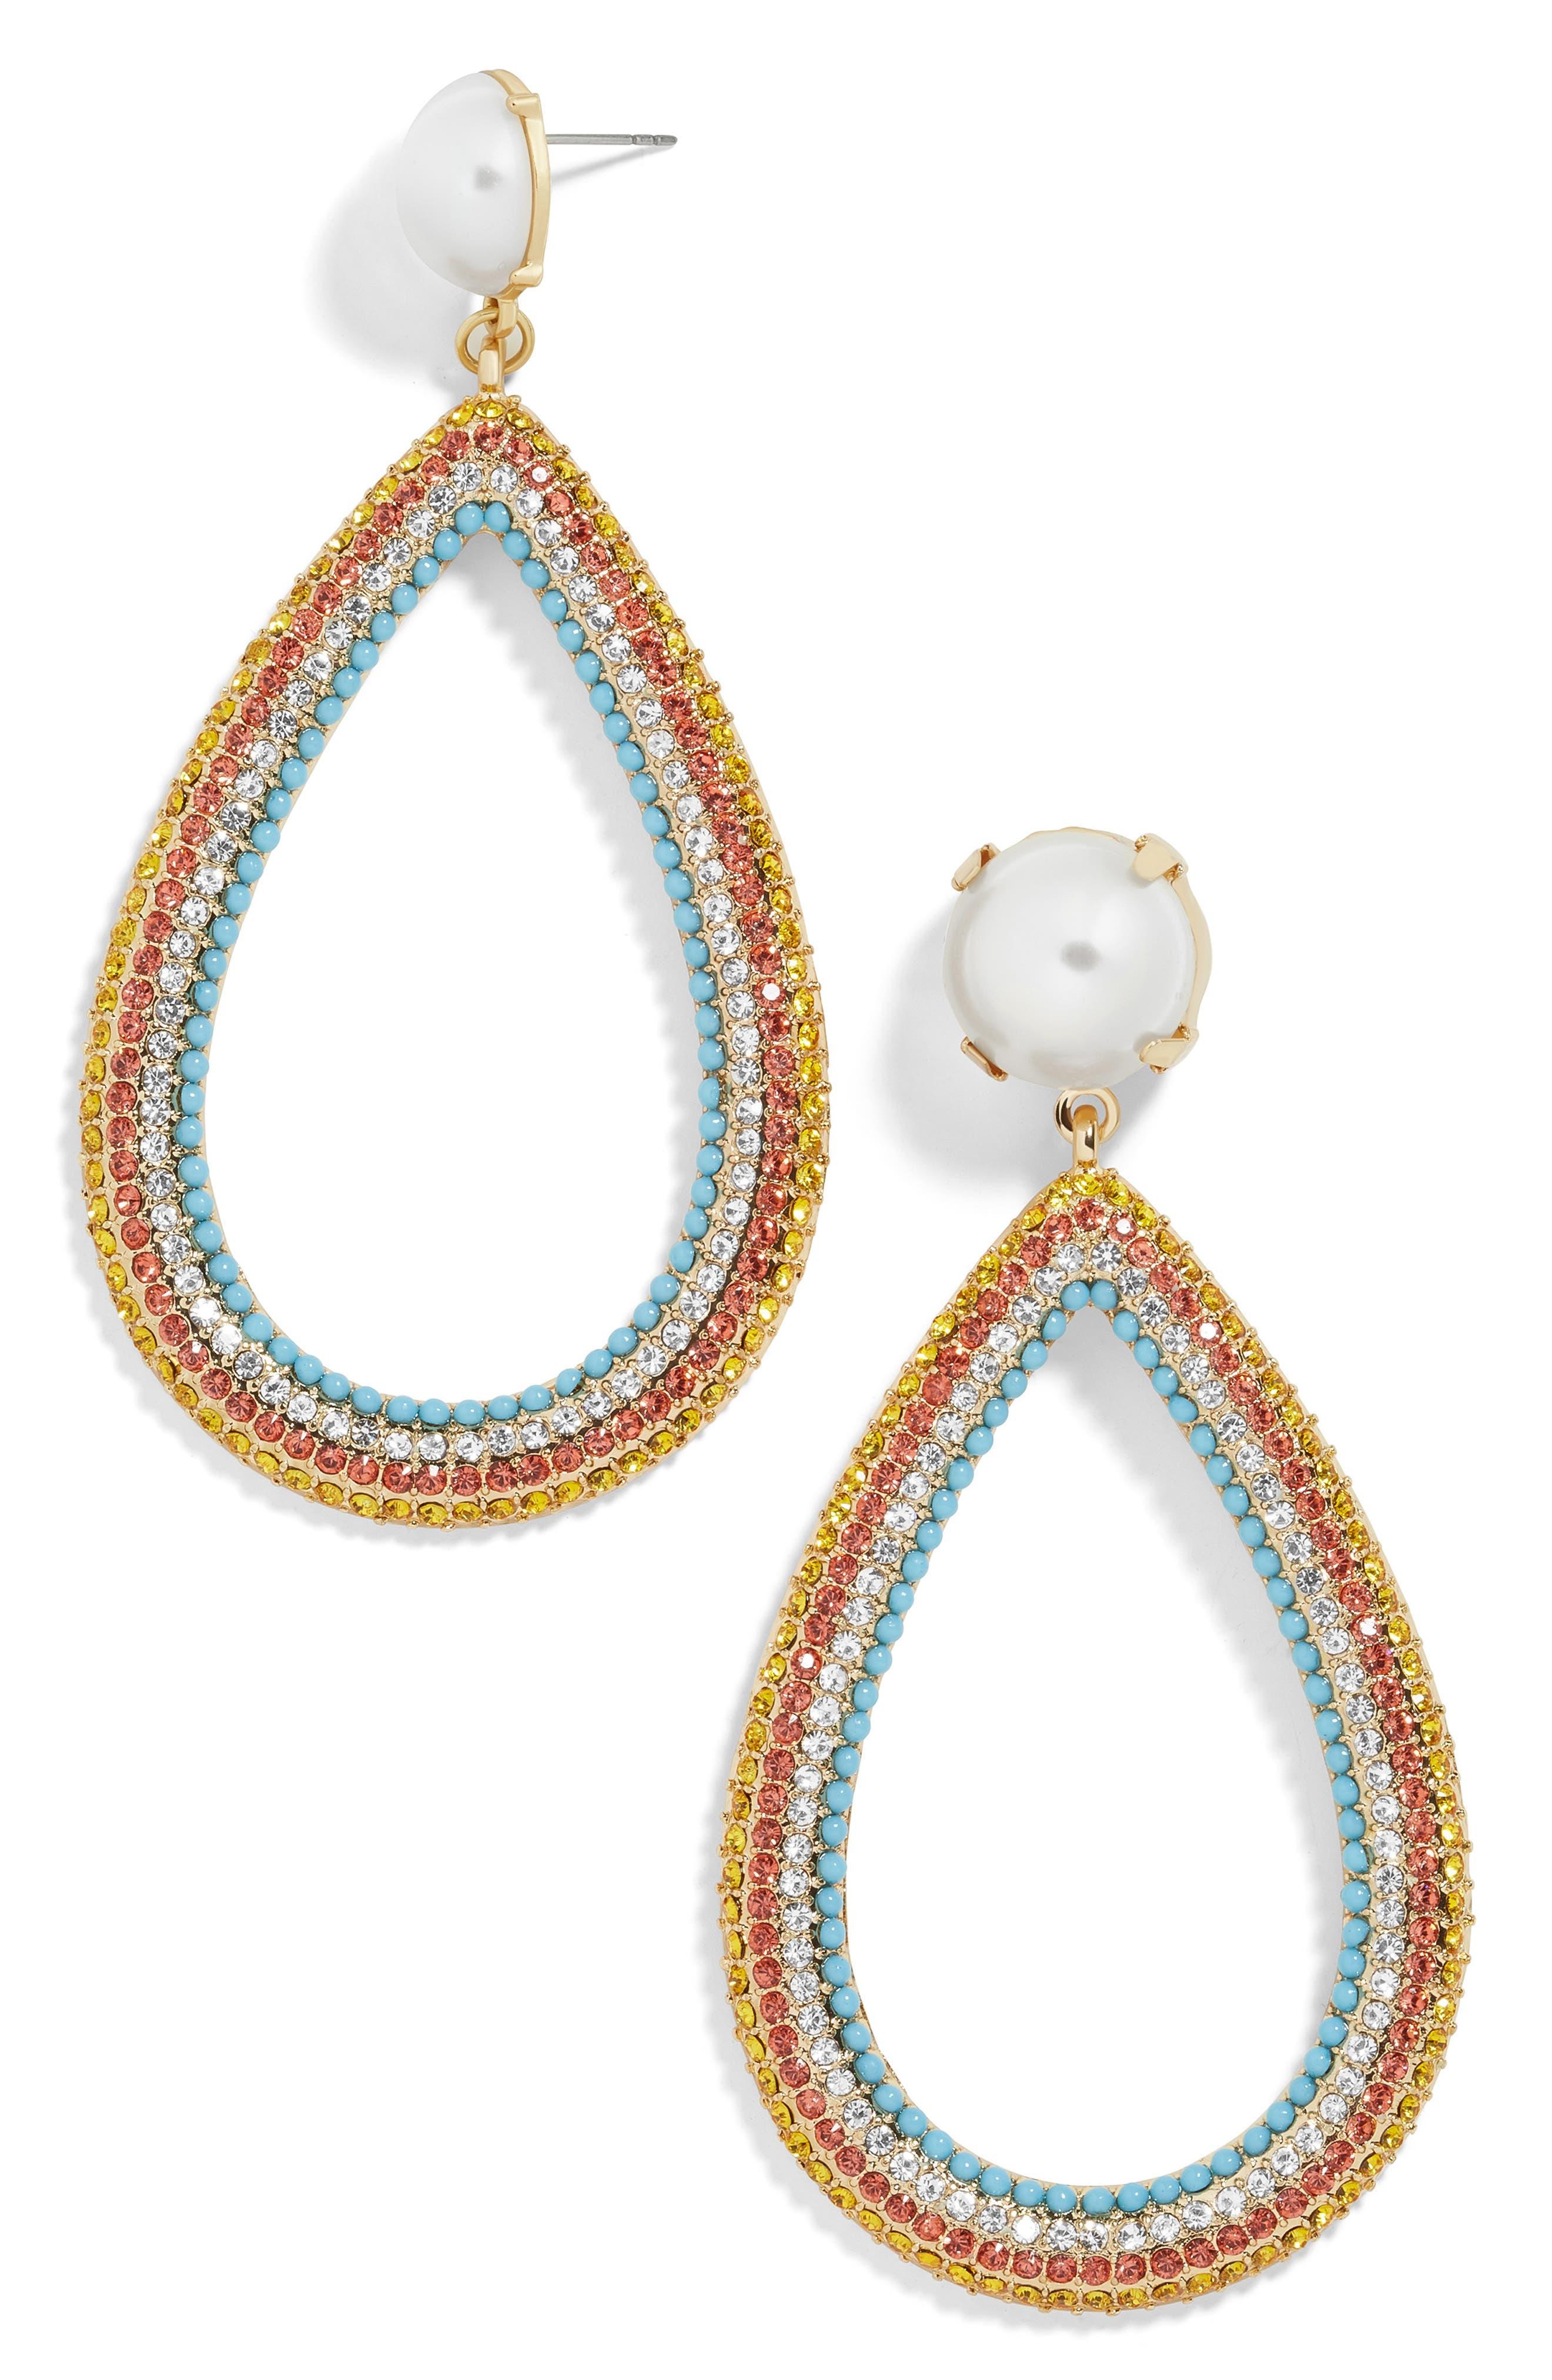 x Micaela Erlanger Ladies Who Lunch Teardrop Earrings,                             Main thumbnail 1, color,                             MULTI/ GOLD